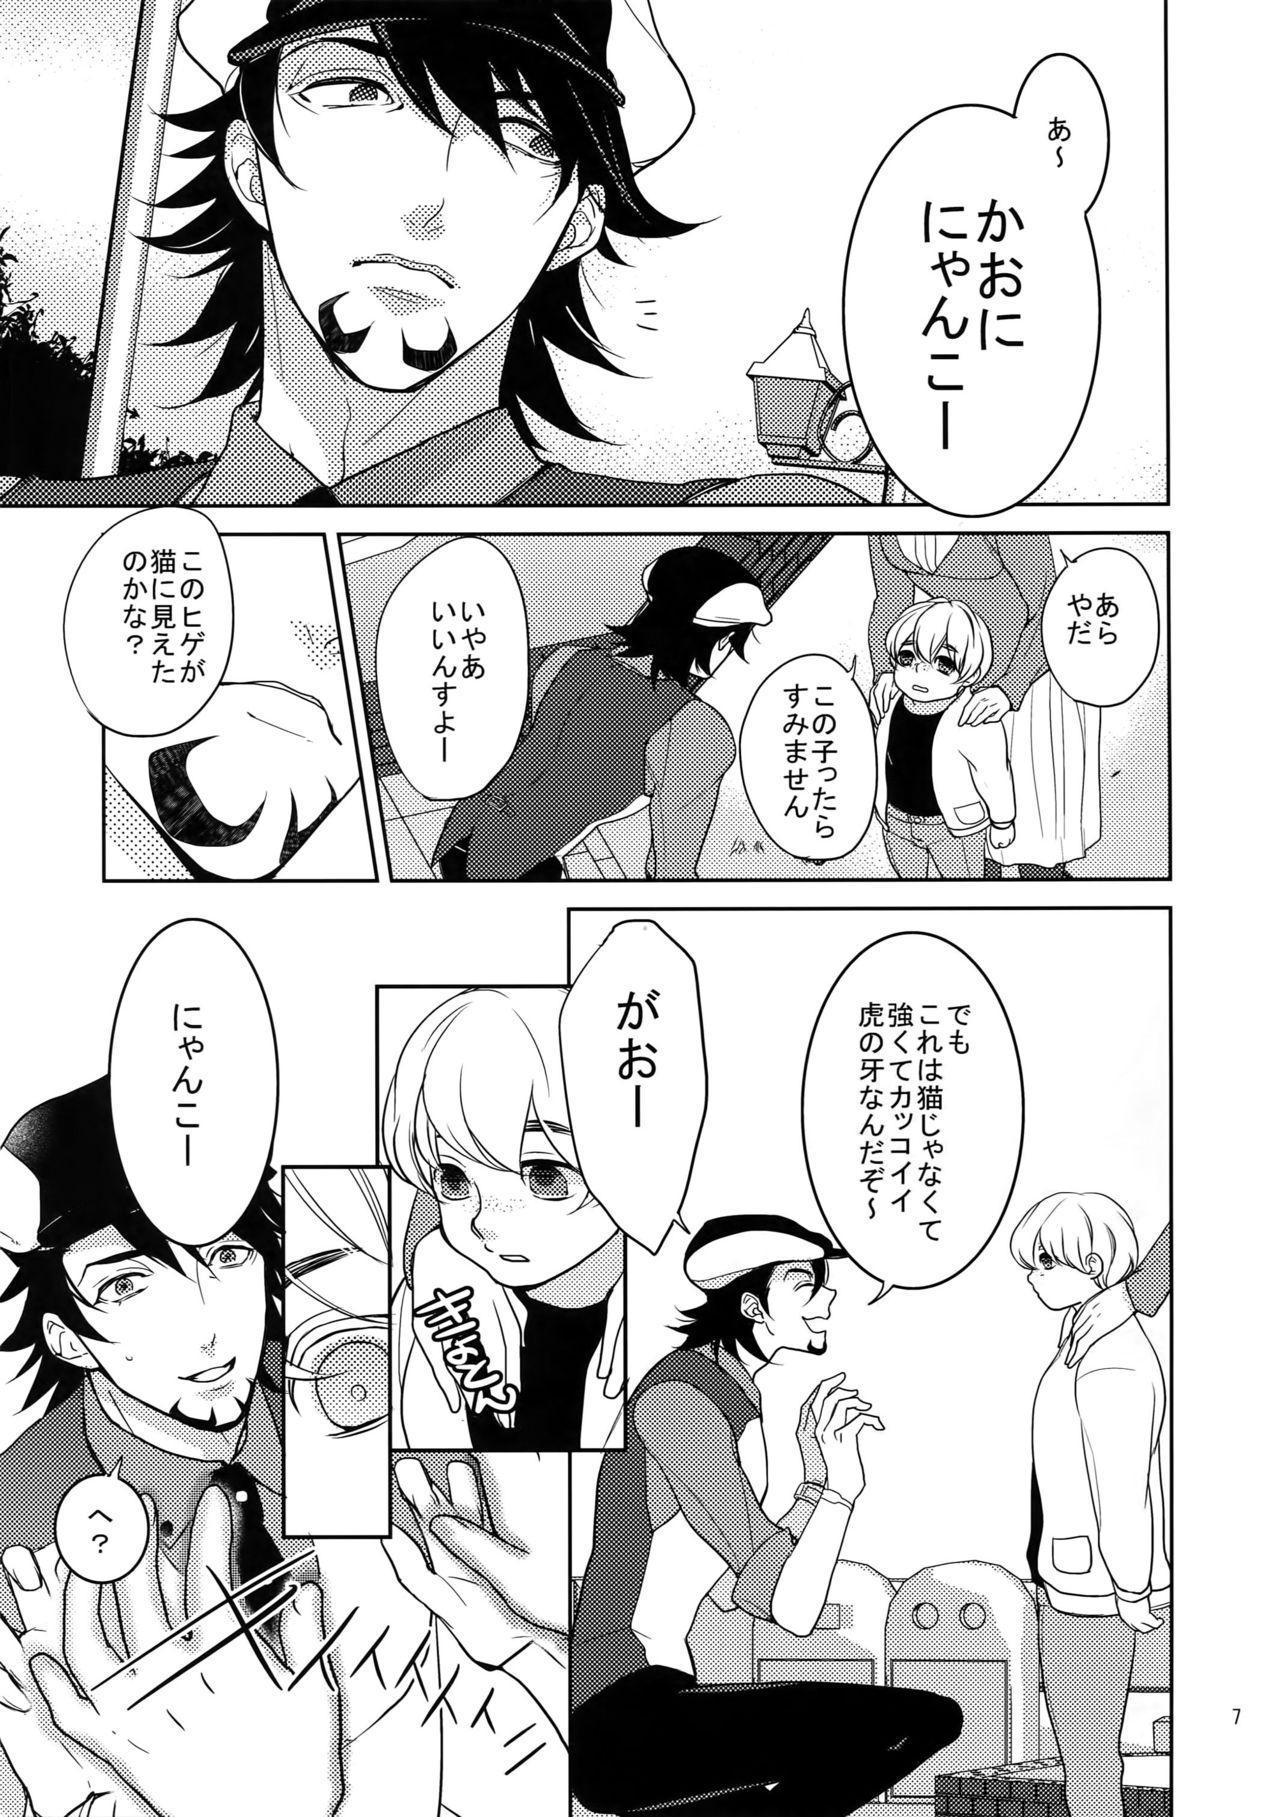 BOROZS Usagi Tora Sairoku 2 5